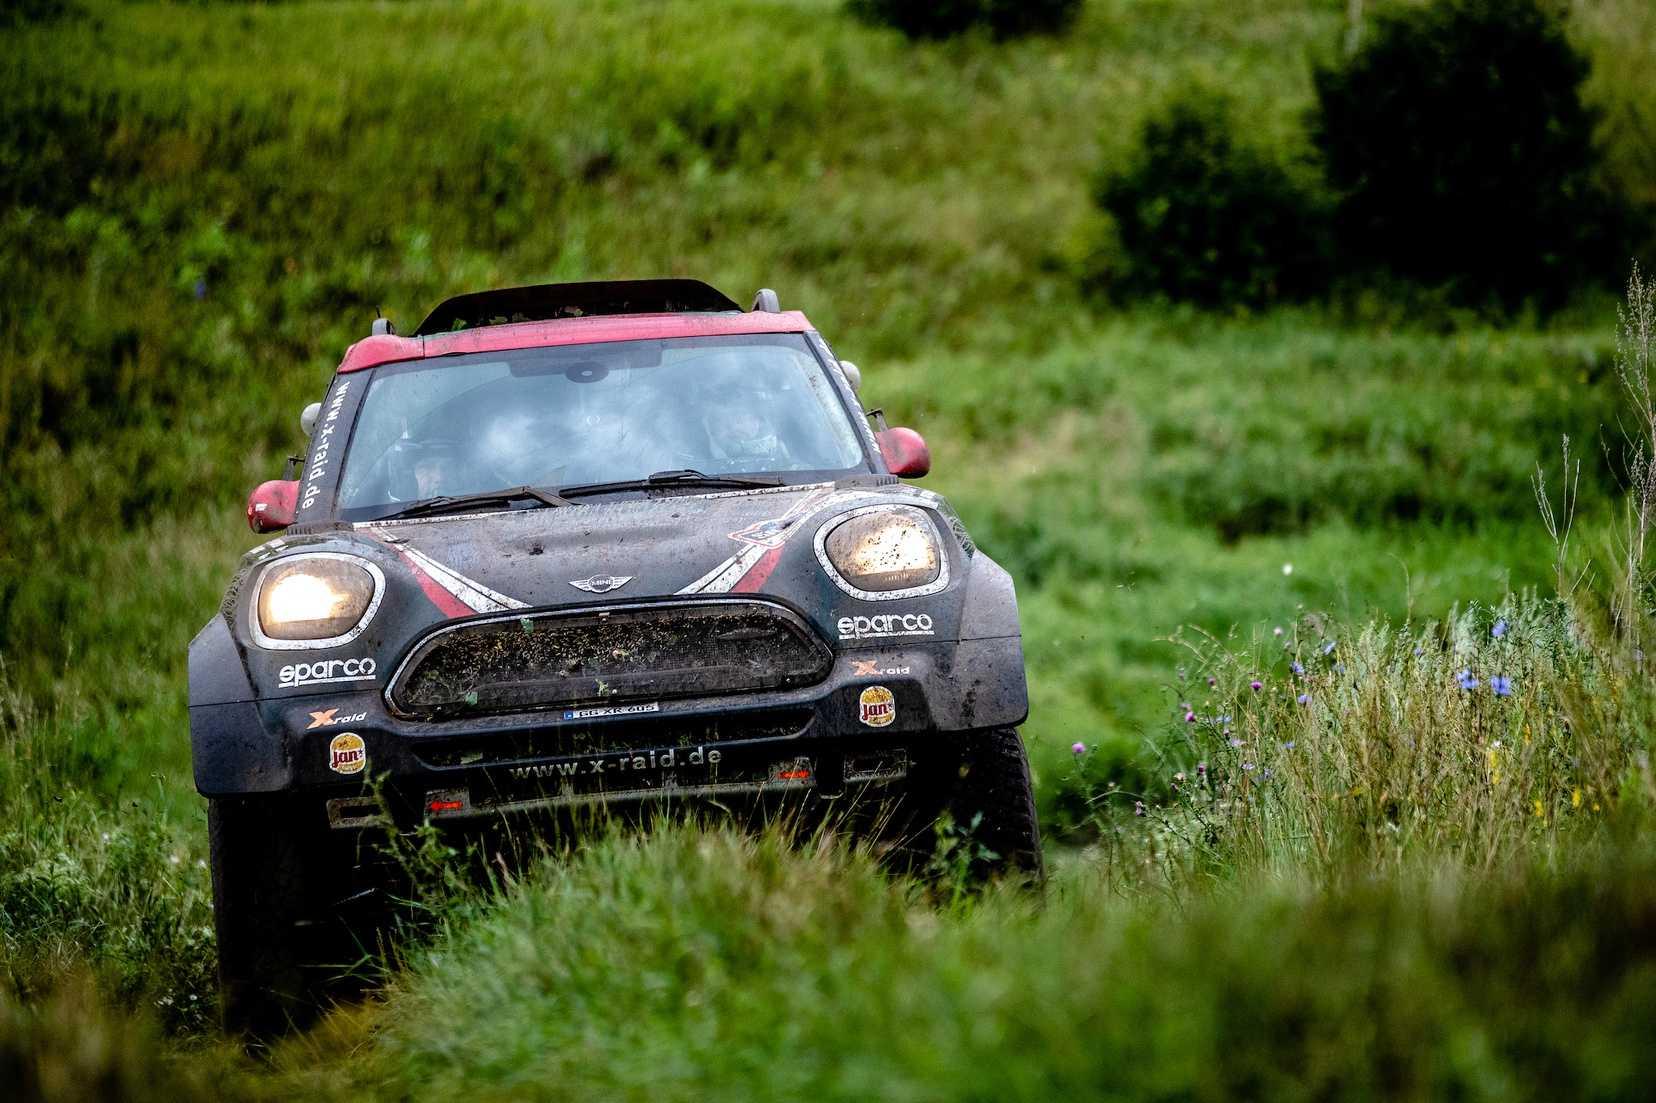 2018 Silk Way Rally Stage 7 Yazeed Al Rajhi Ksa Timo Gottschalk Ger Mini John Cooper Works X Raid Team 103 27 07